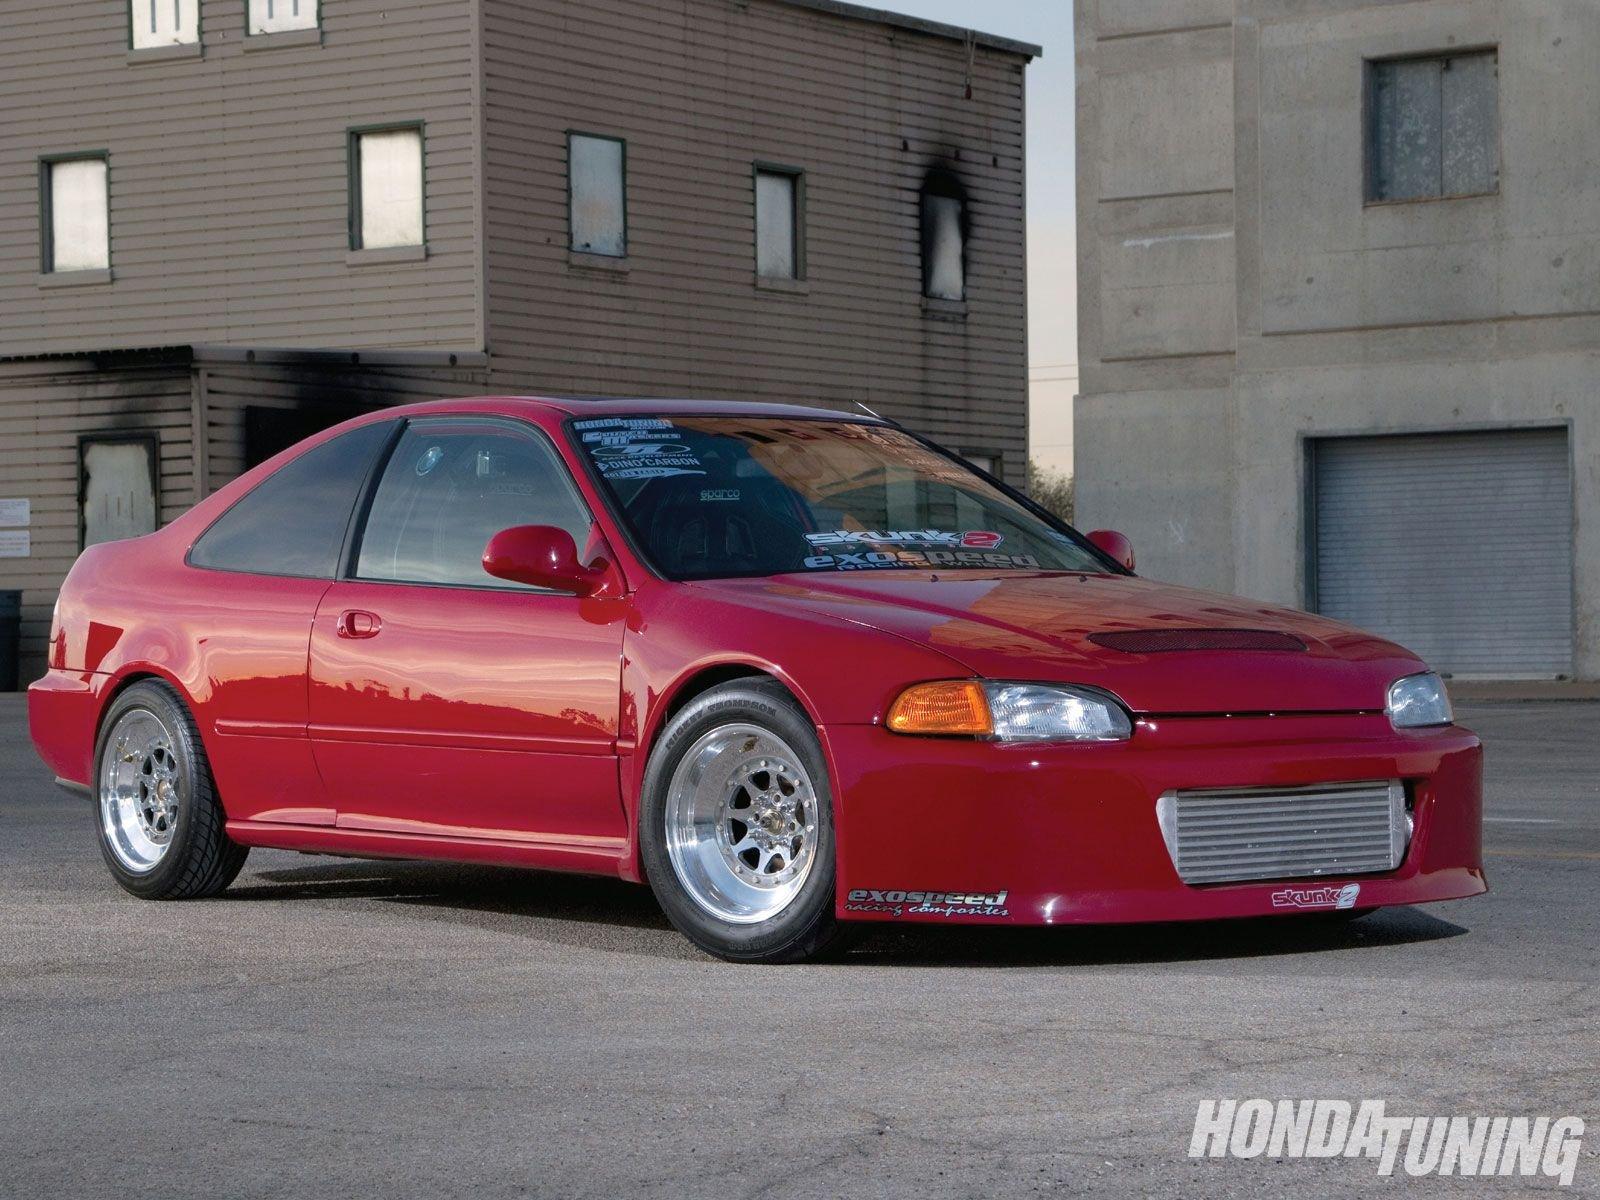 Wallpaper 1600x1200 Px Cars Civic Coupe Honda Japan R Sedan Tuning Type 1600x1200 Wallup 1902395 Hd Wallpapers Wallhere